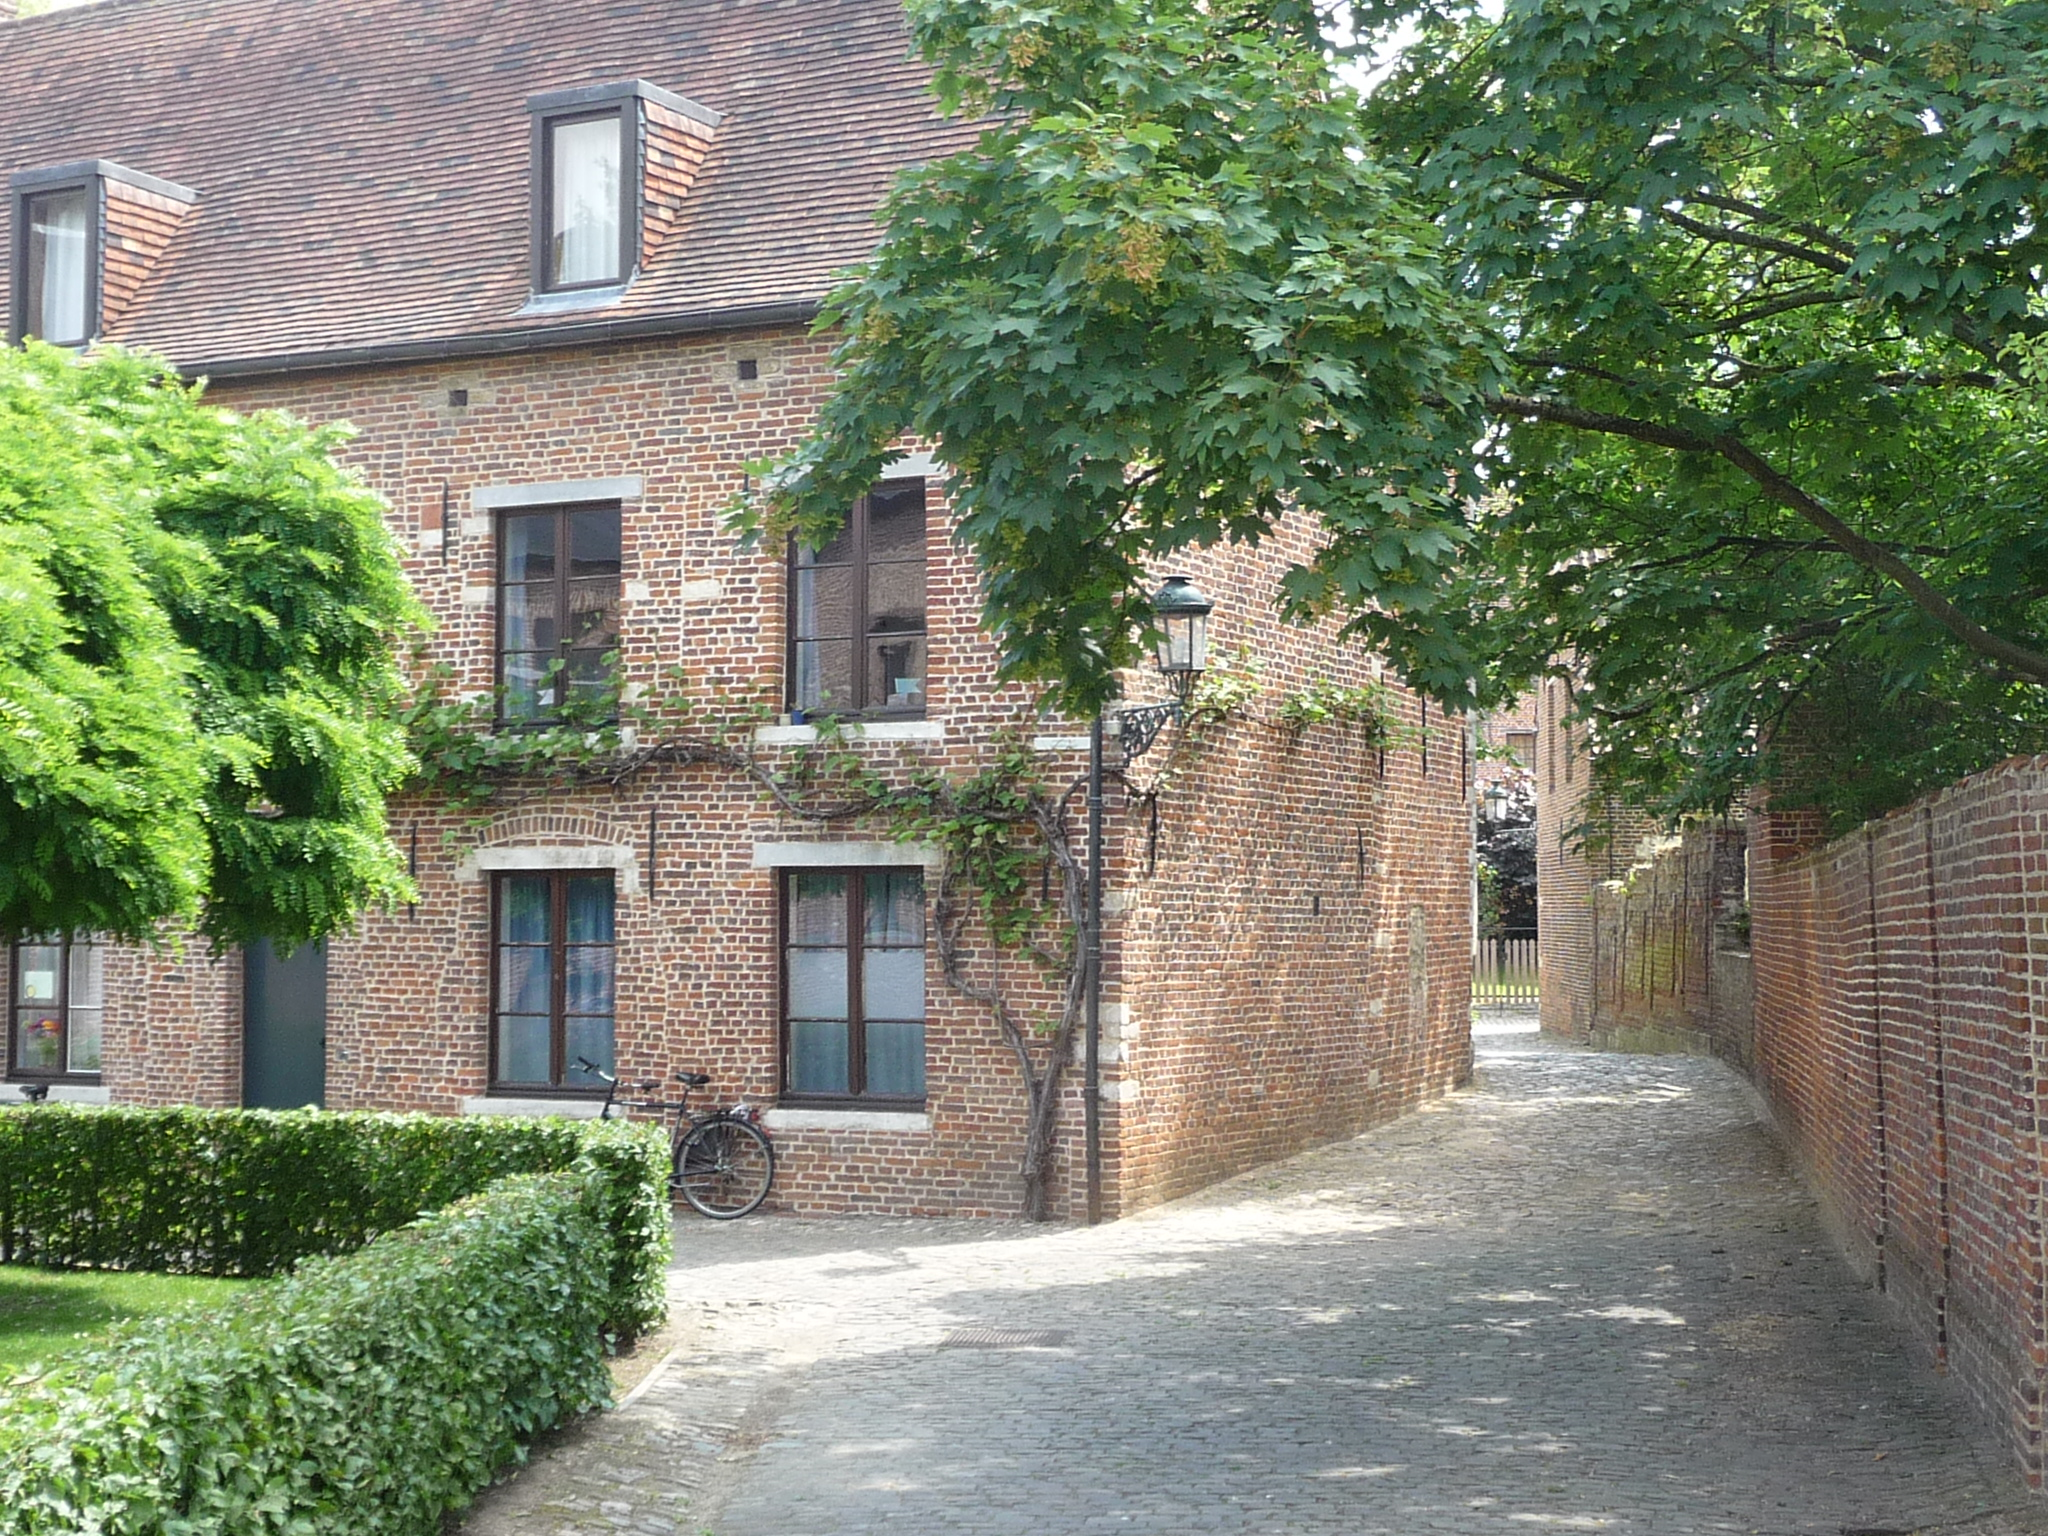 Enjoy the narrow streets of the Groot Begijnhof